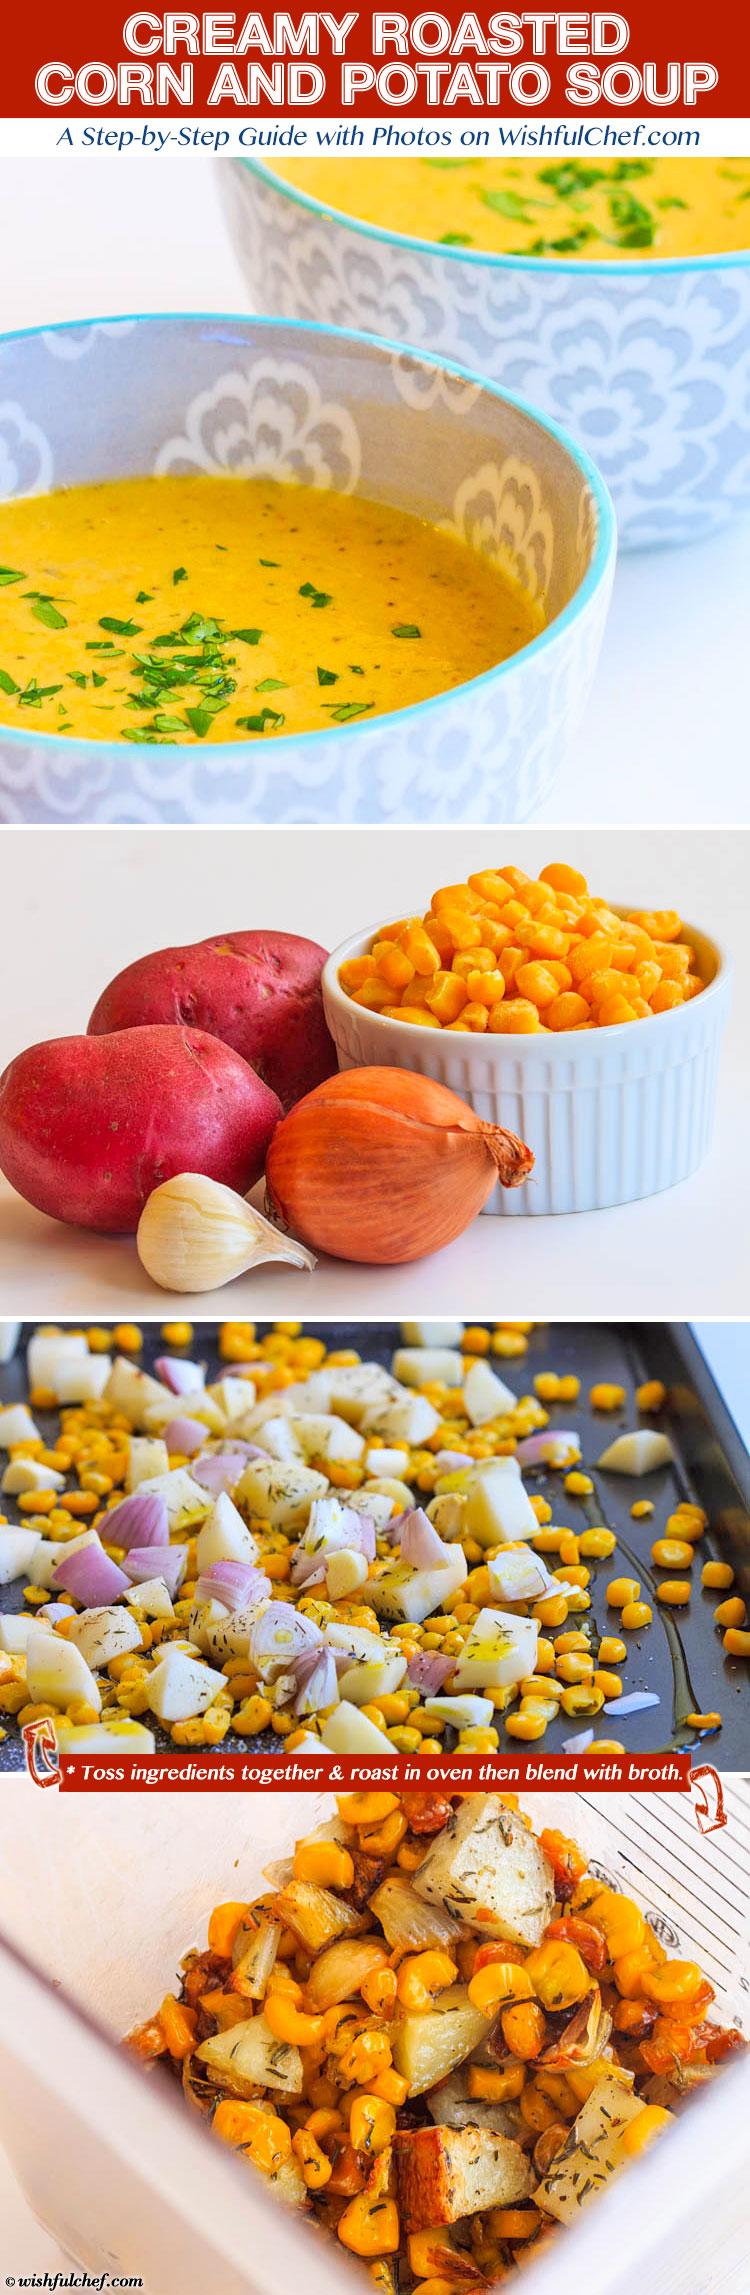 Creamy Roasted Corn Potato Soup